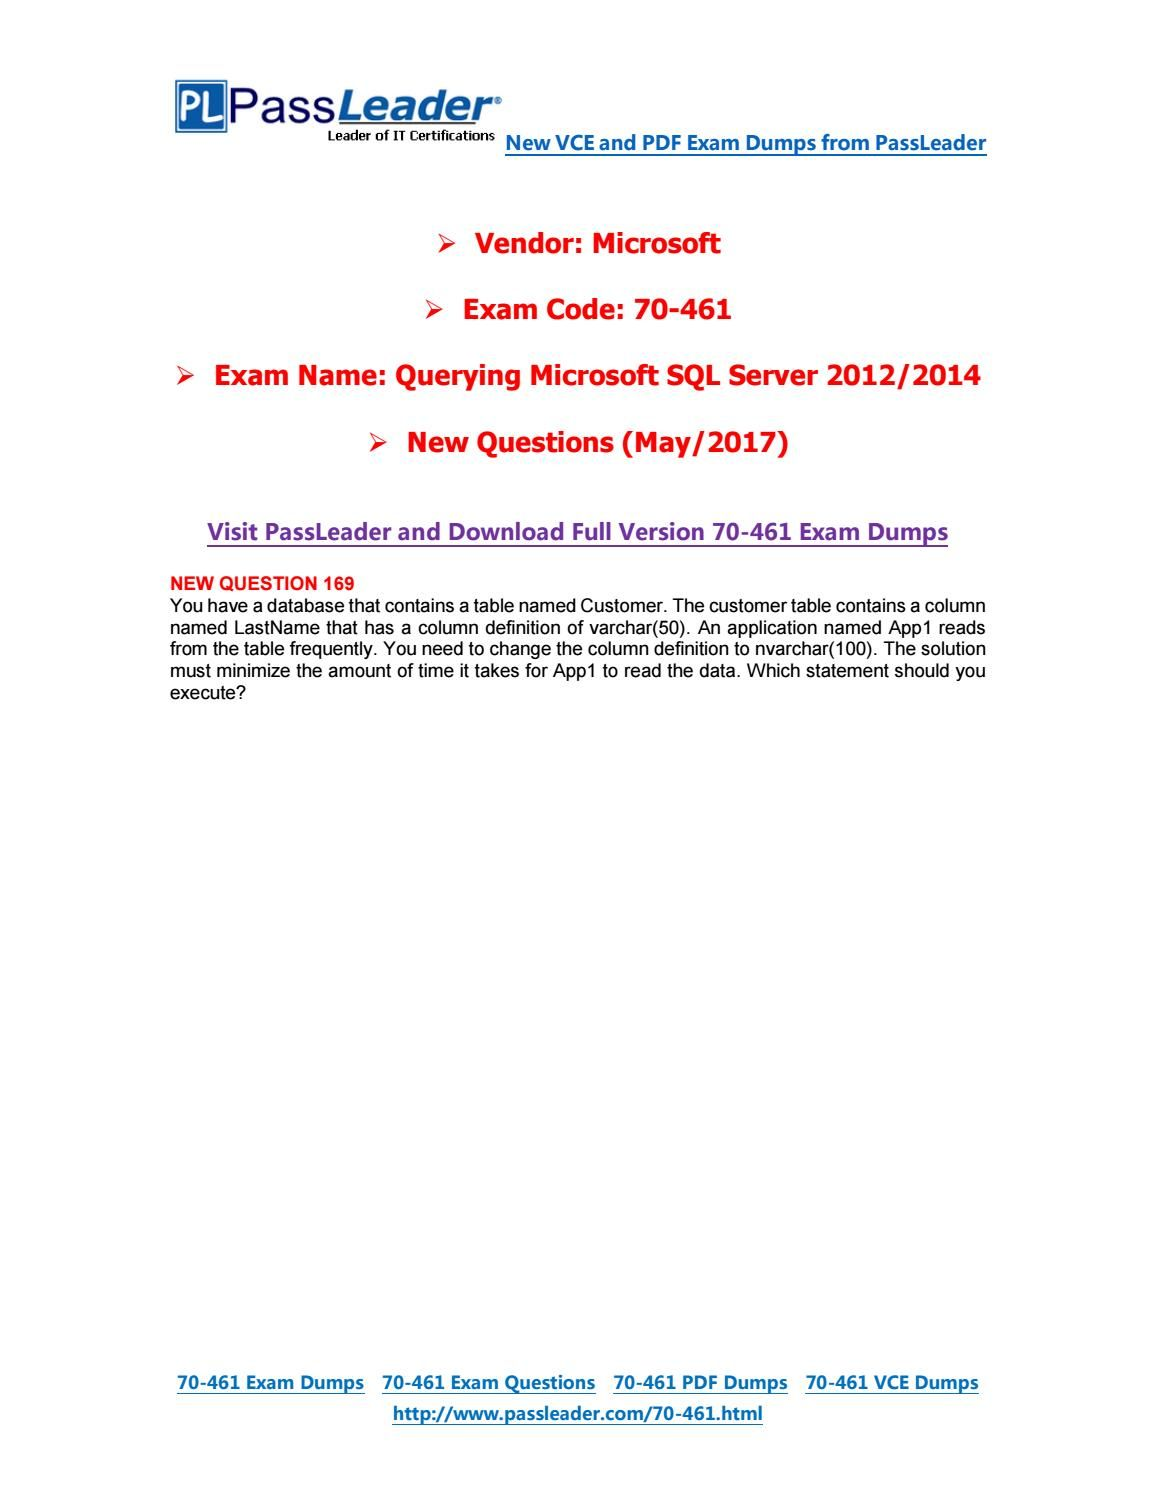 70-461 ebook download exam free